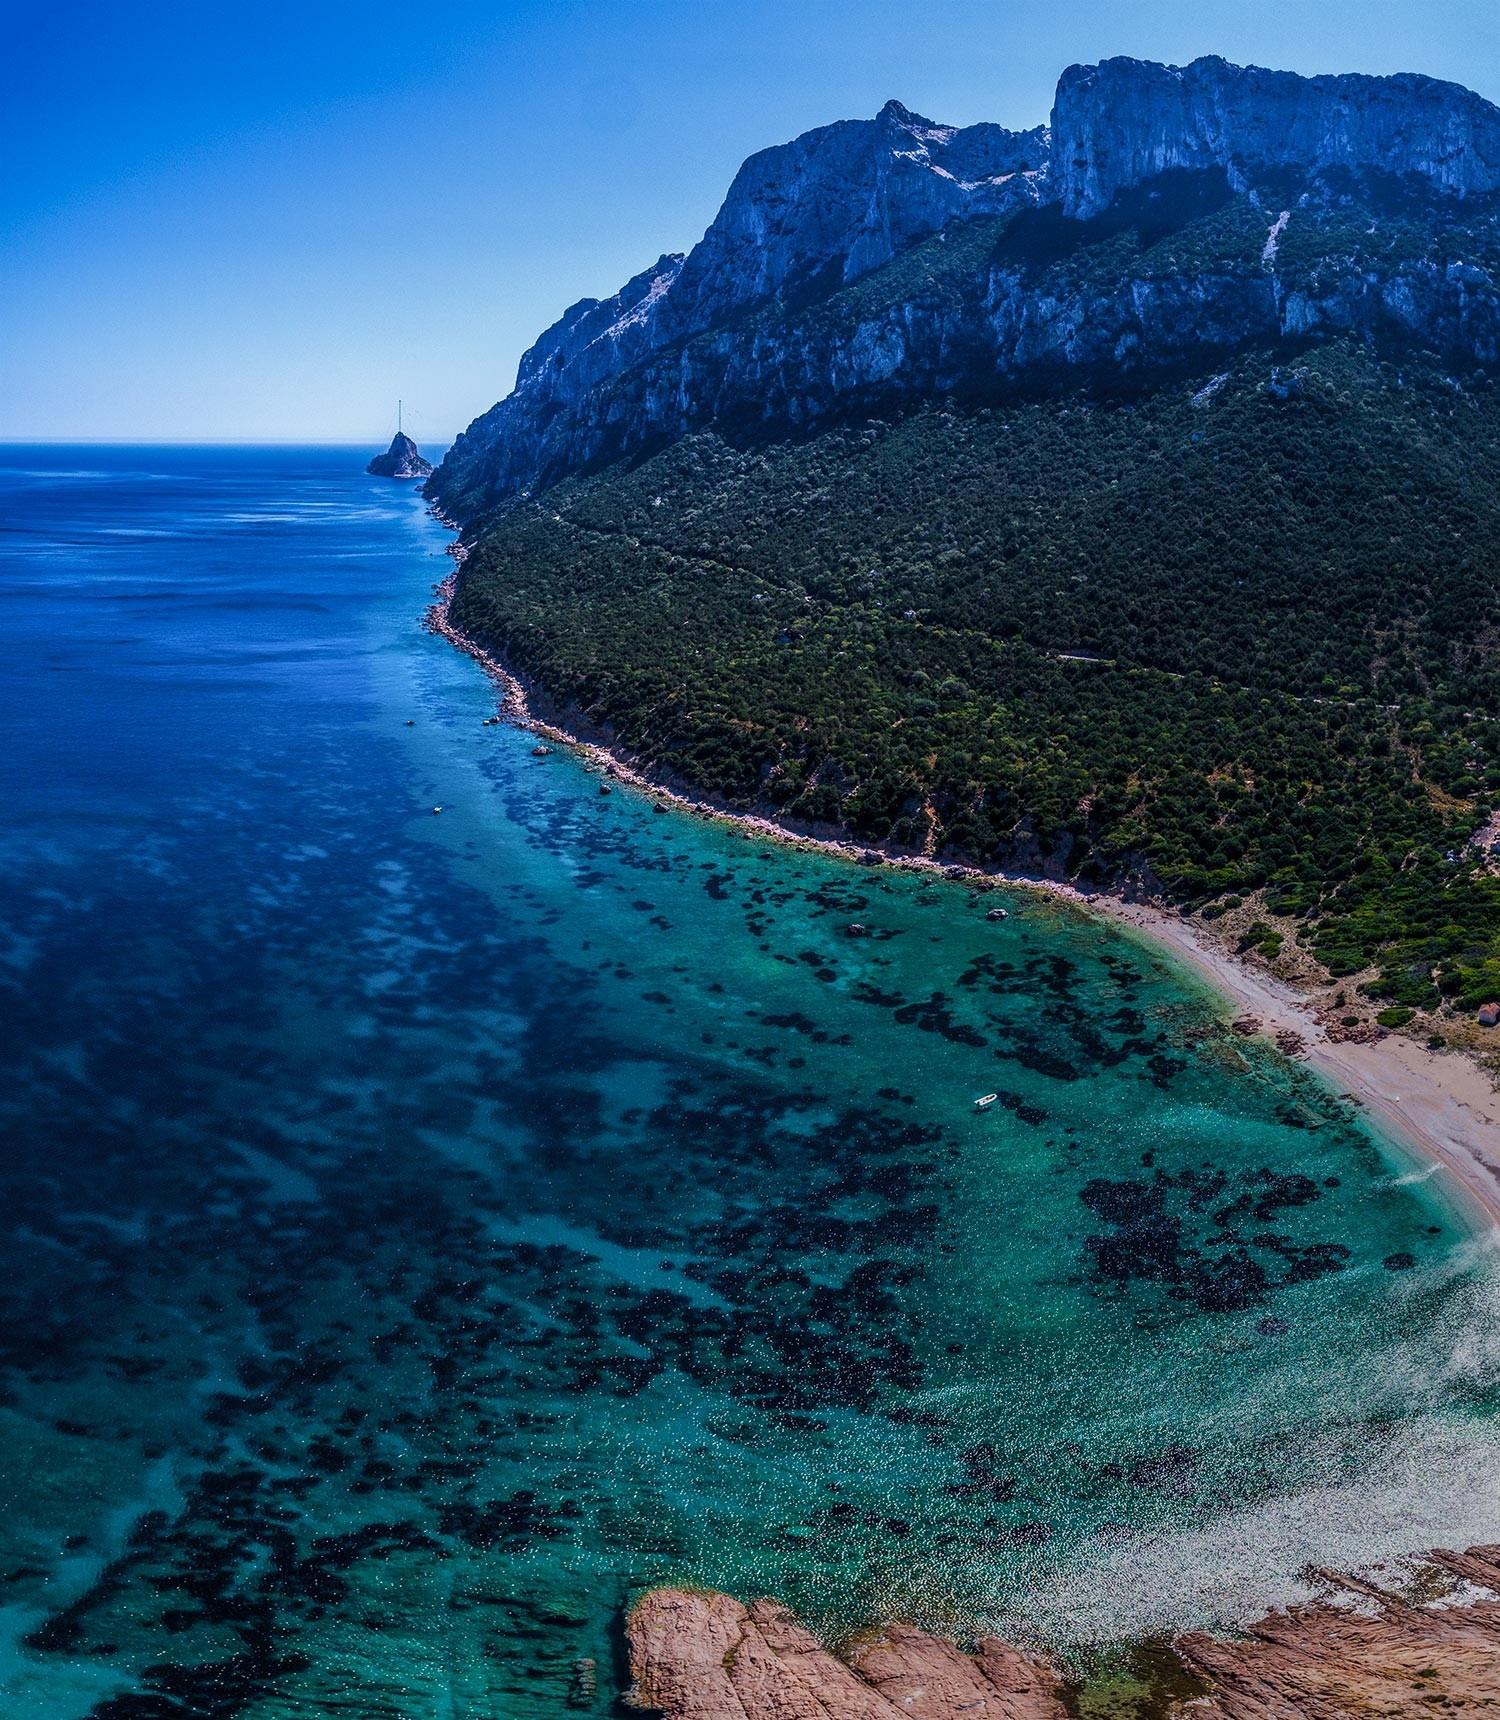 Isola Tavolara 2 Sardinia Sardinia Aerial Photography drone Enrico Pescantini